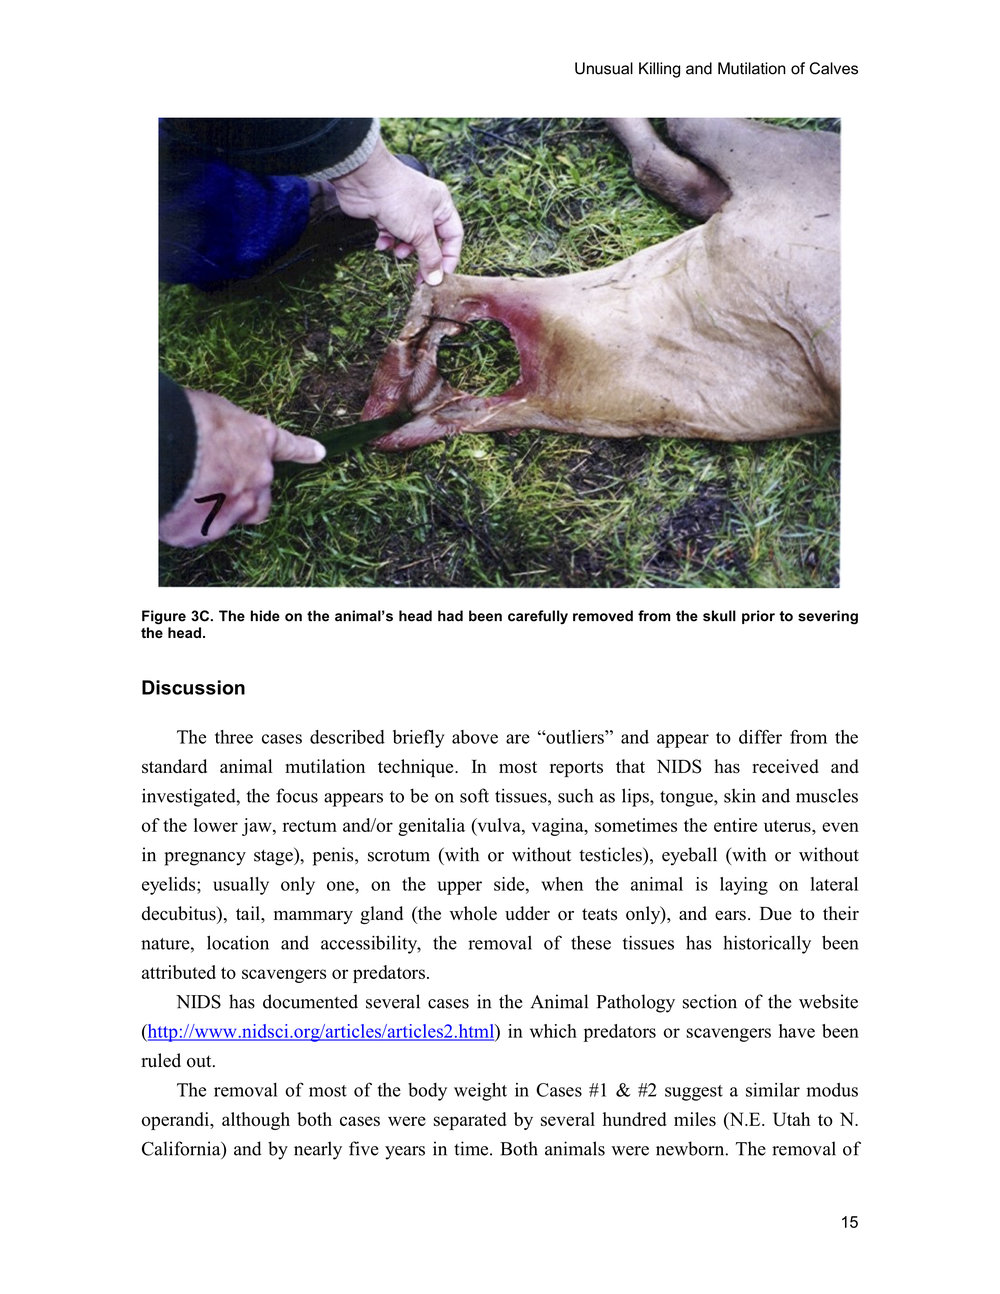 1997 ANIMAL MUTILATION REPORT 14.jpg